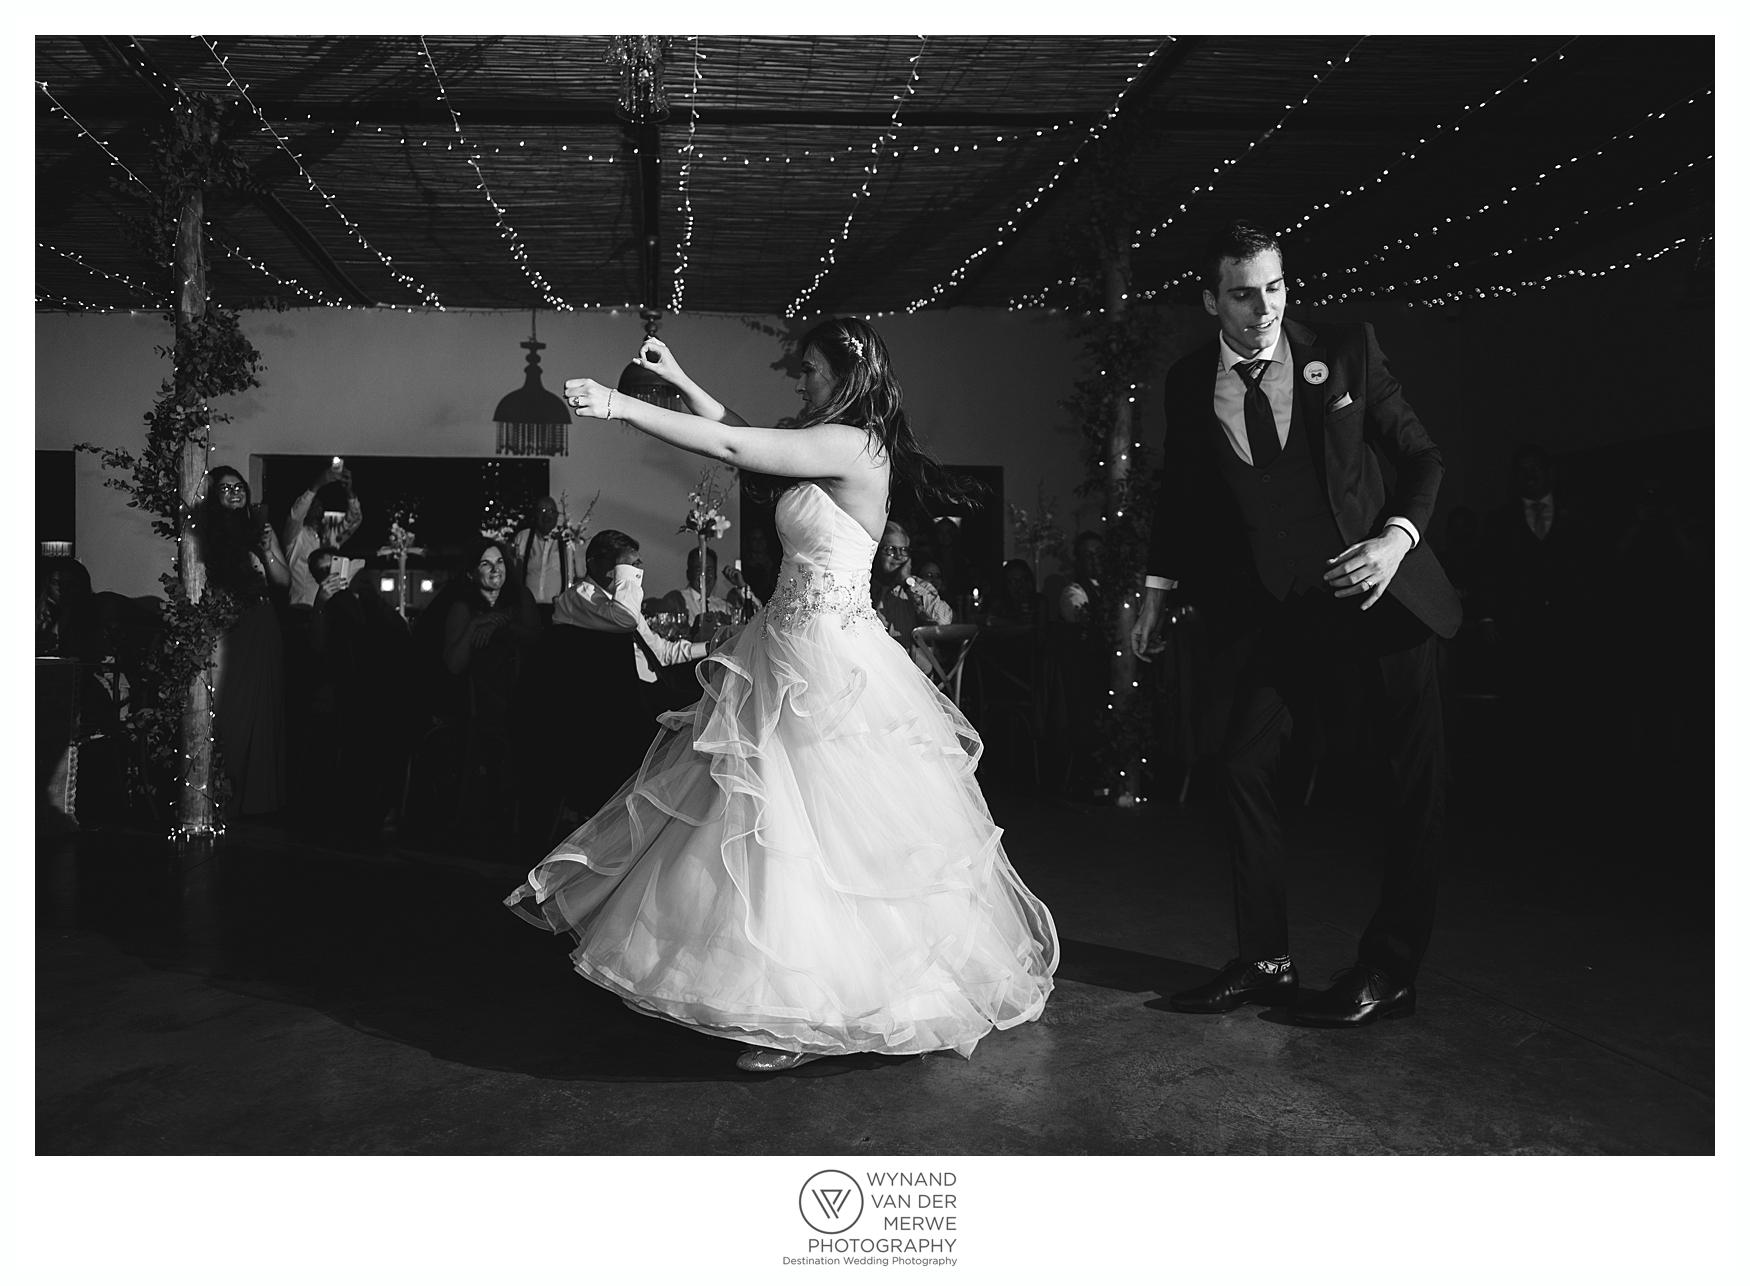 Wynandvandermerwe ryan natalia wedding photography cradle valley guesthouse gauteng-708.jpg